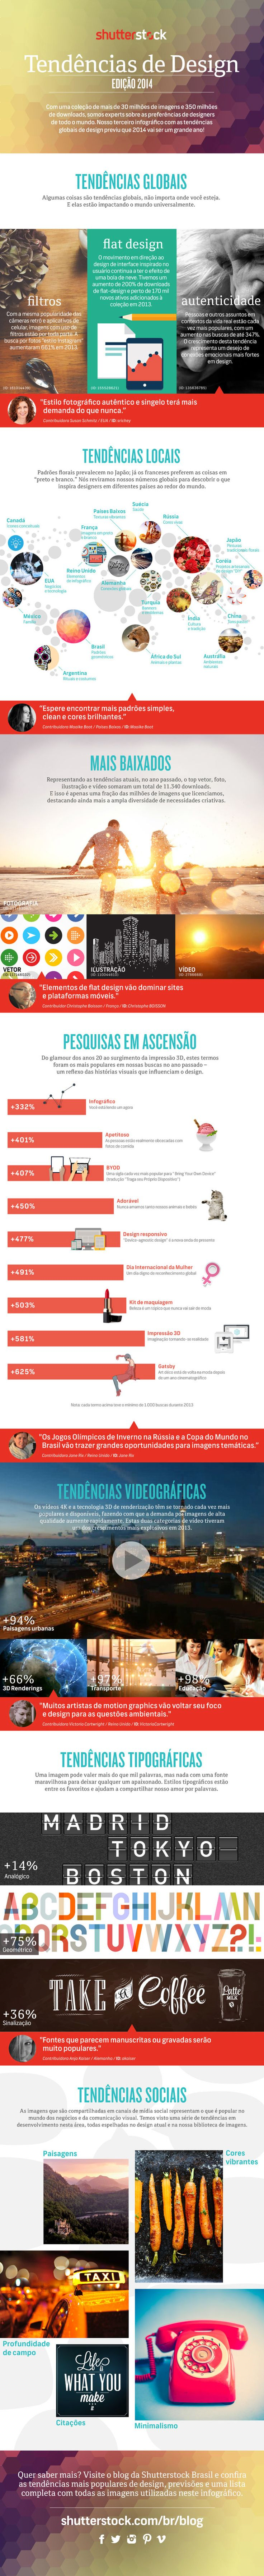 tendencia-design-2014-infographic-shuterstock